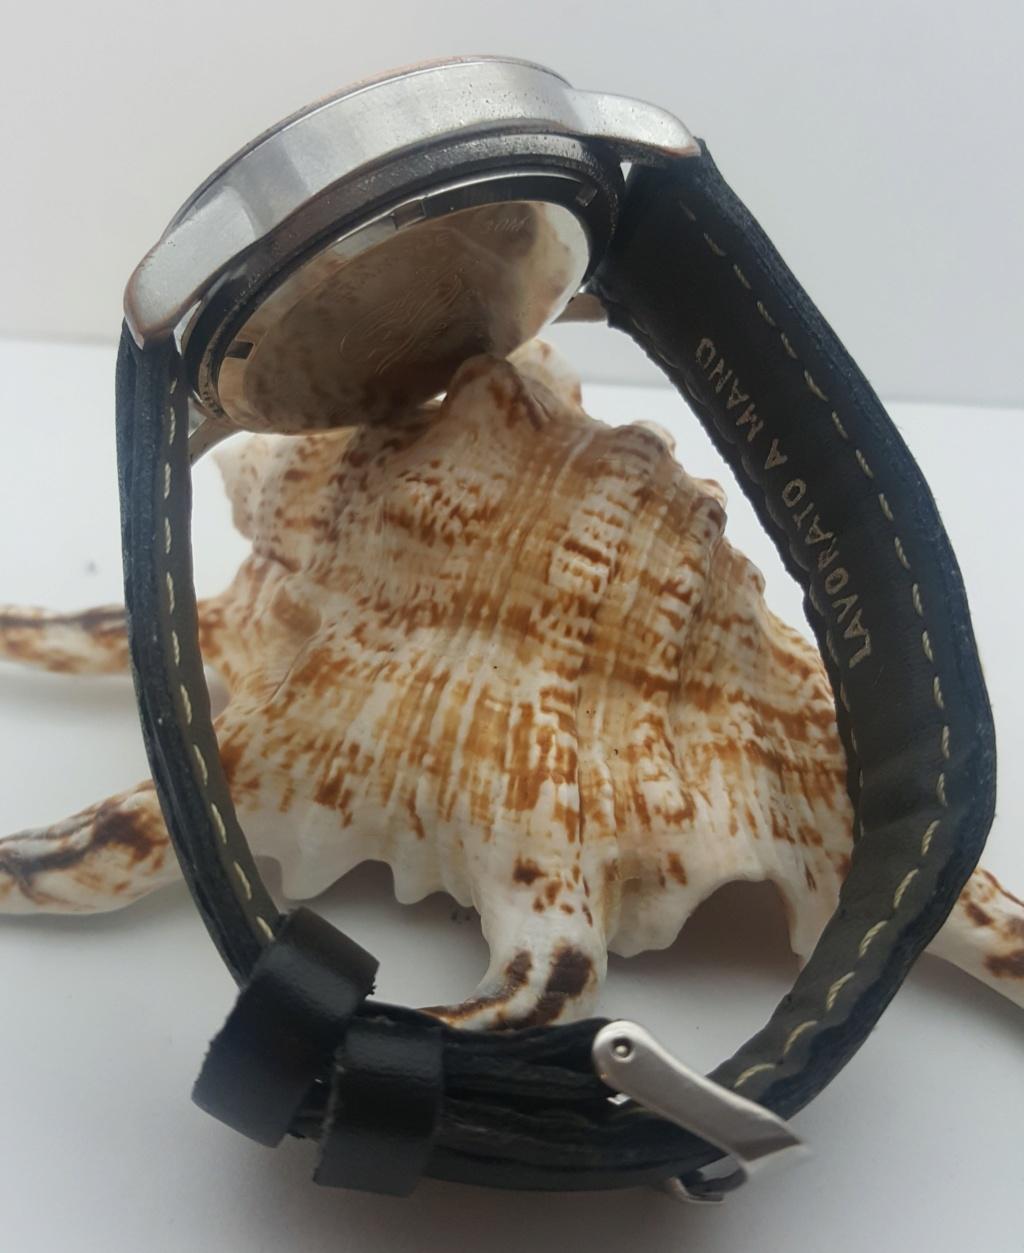 [Vendido] Relógio  LIP Type 10 Croix du Sud/Jean Mermoz Edt. - 100% OK 0512